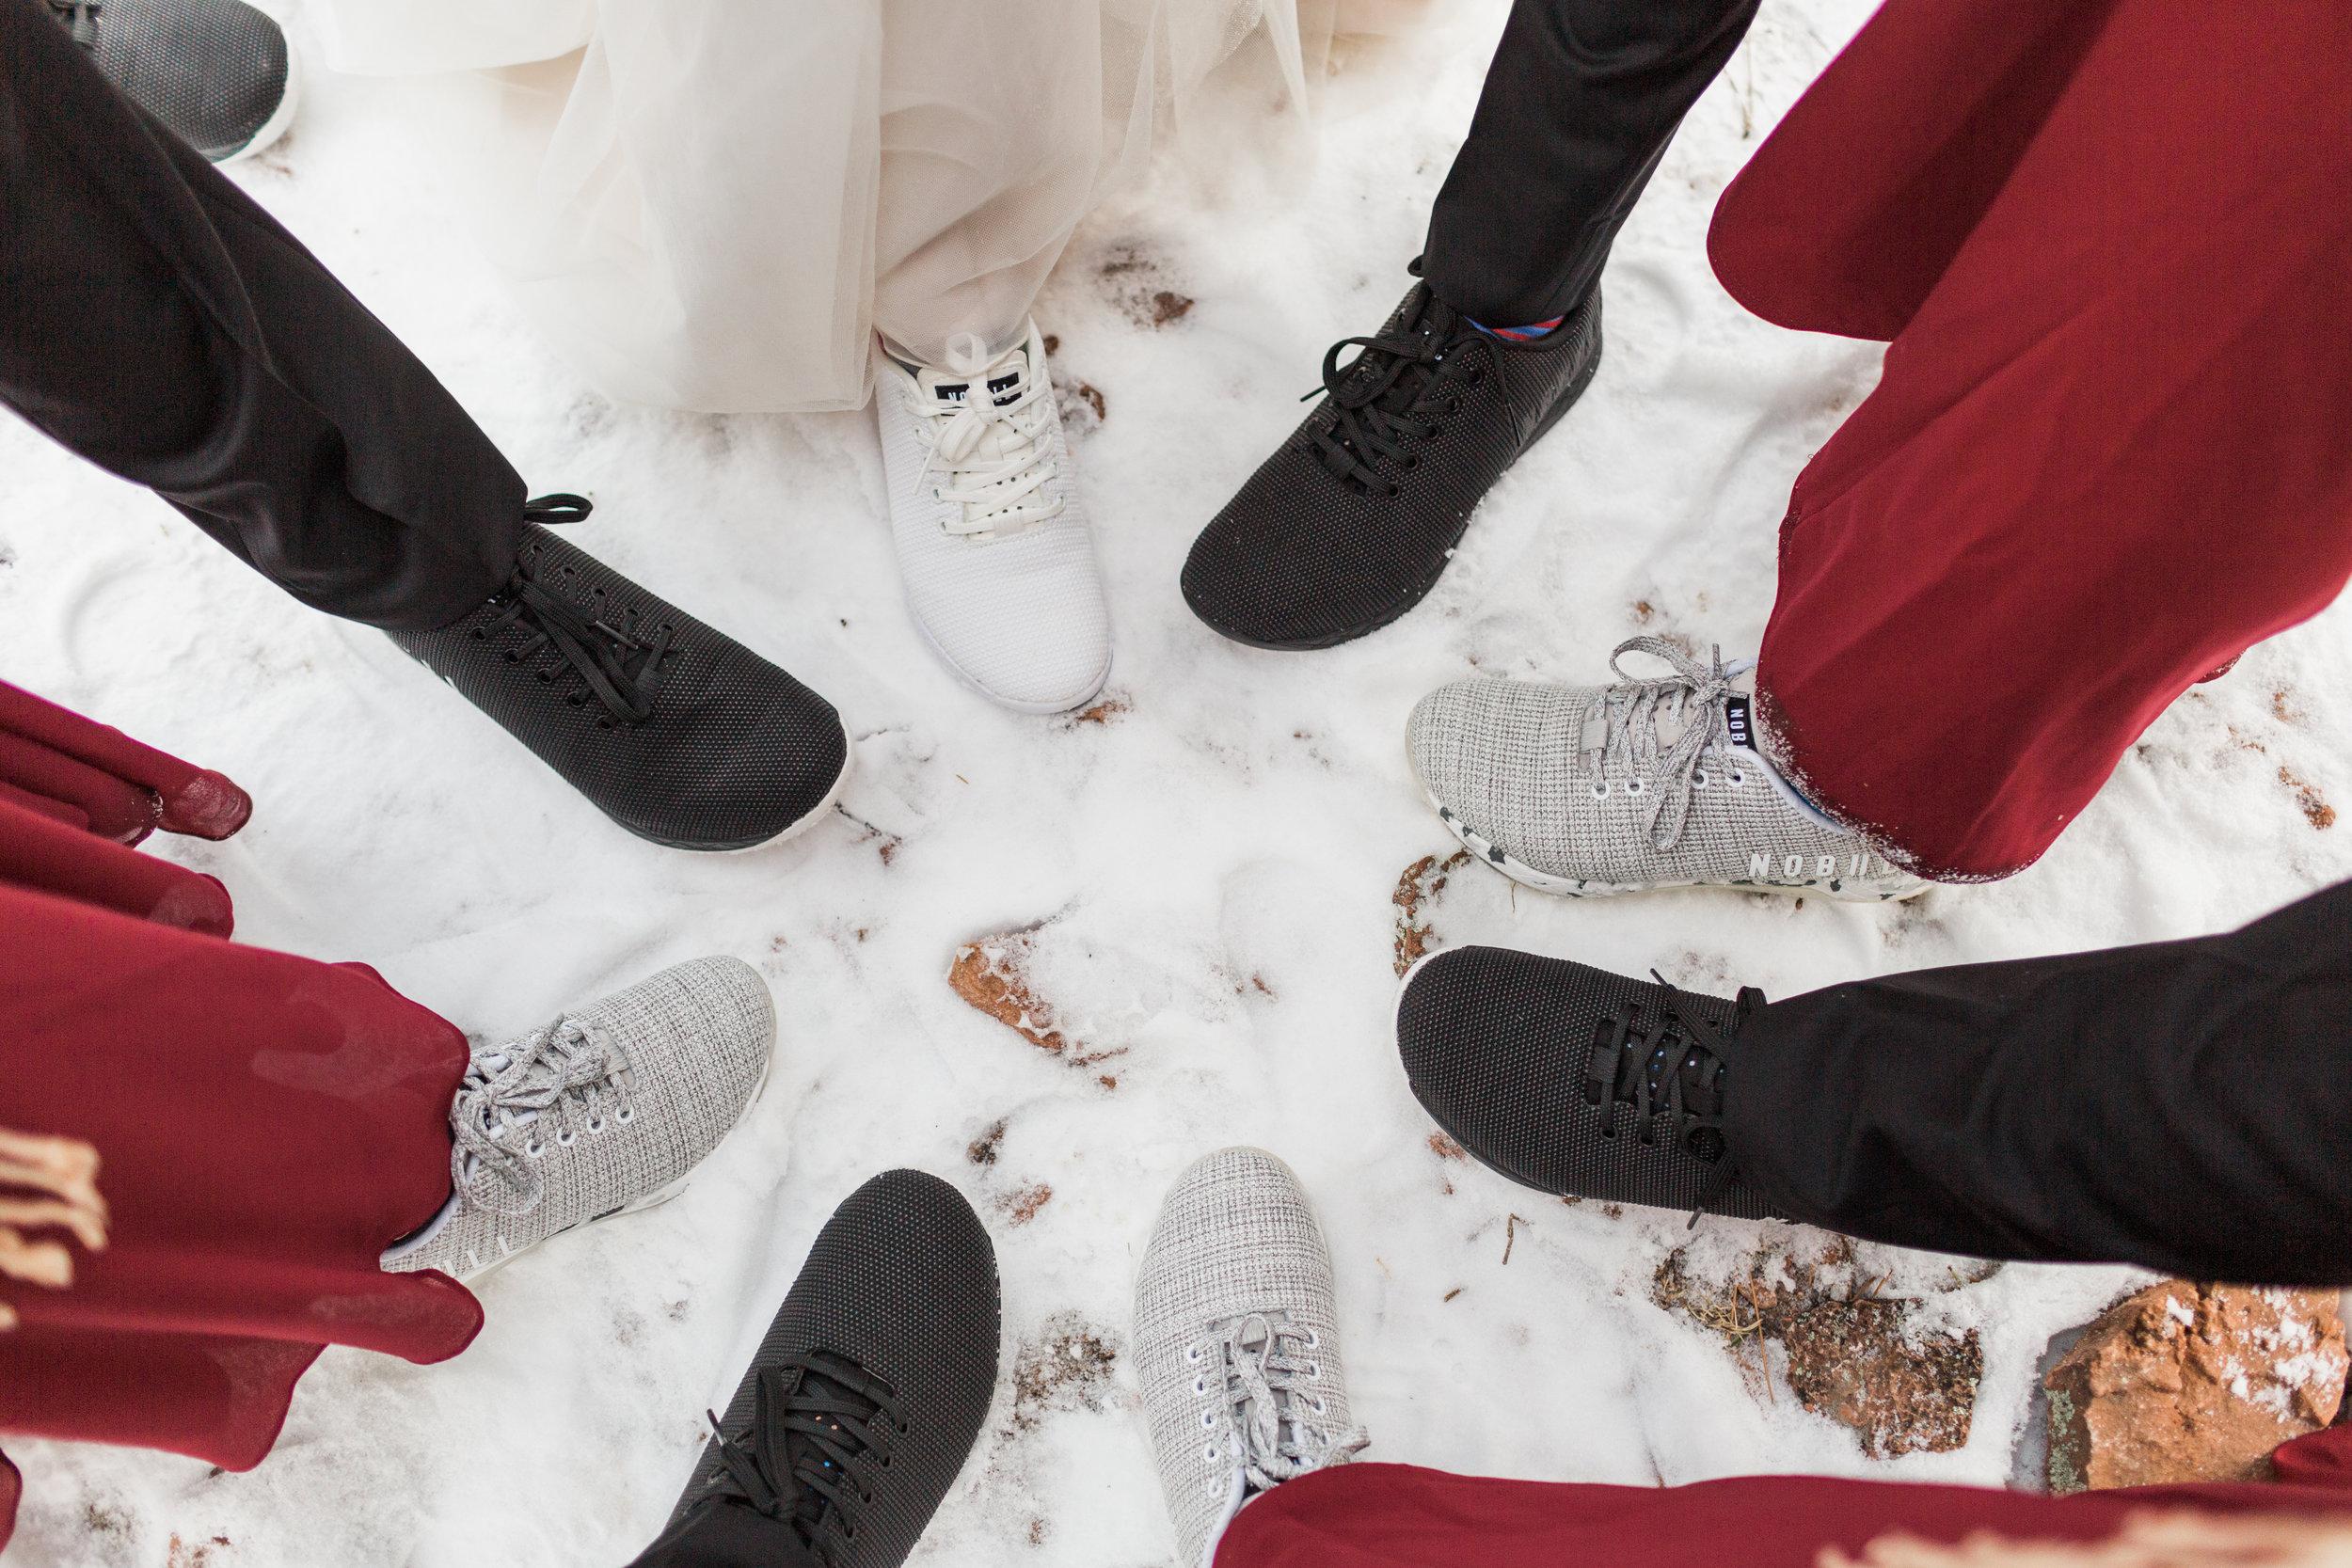 romanticcoloradodestinationwedding-38.jpg